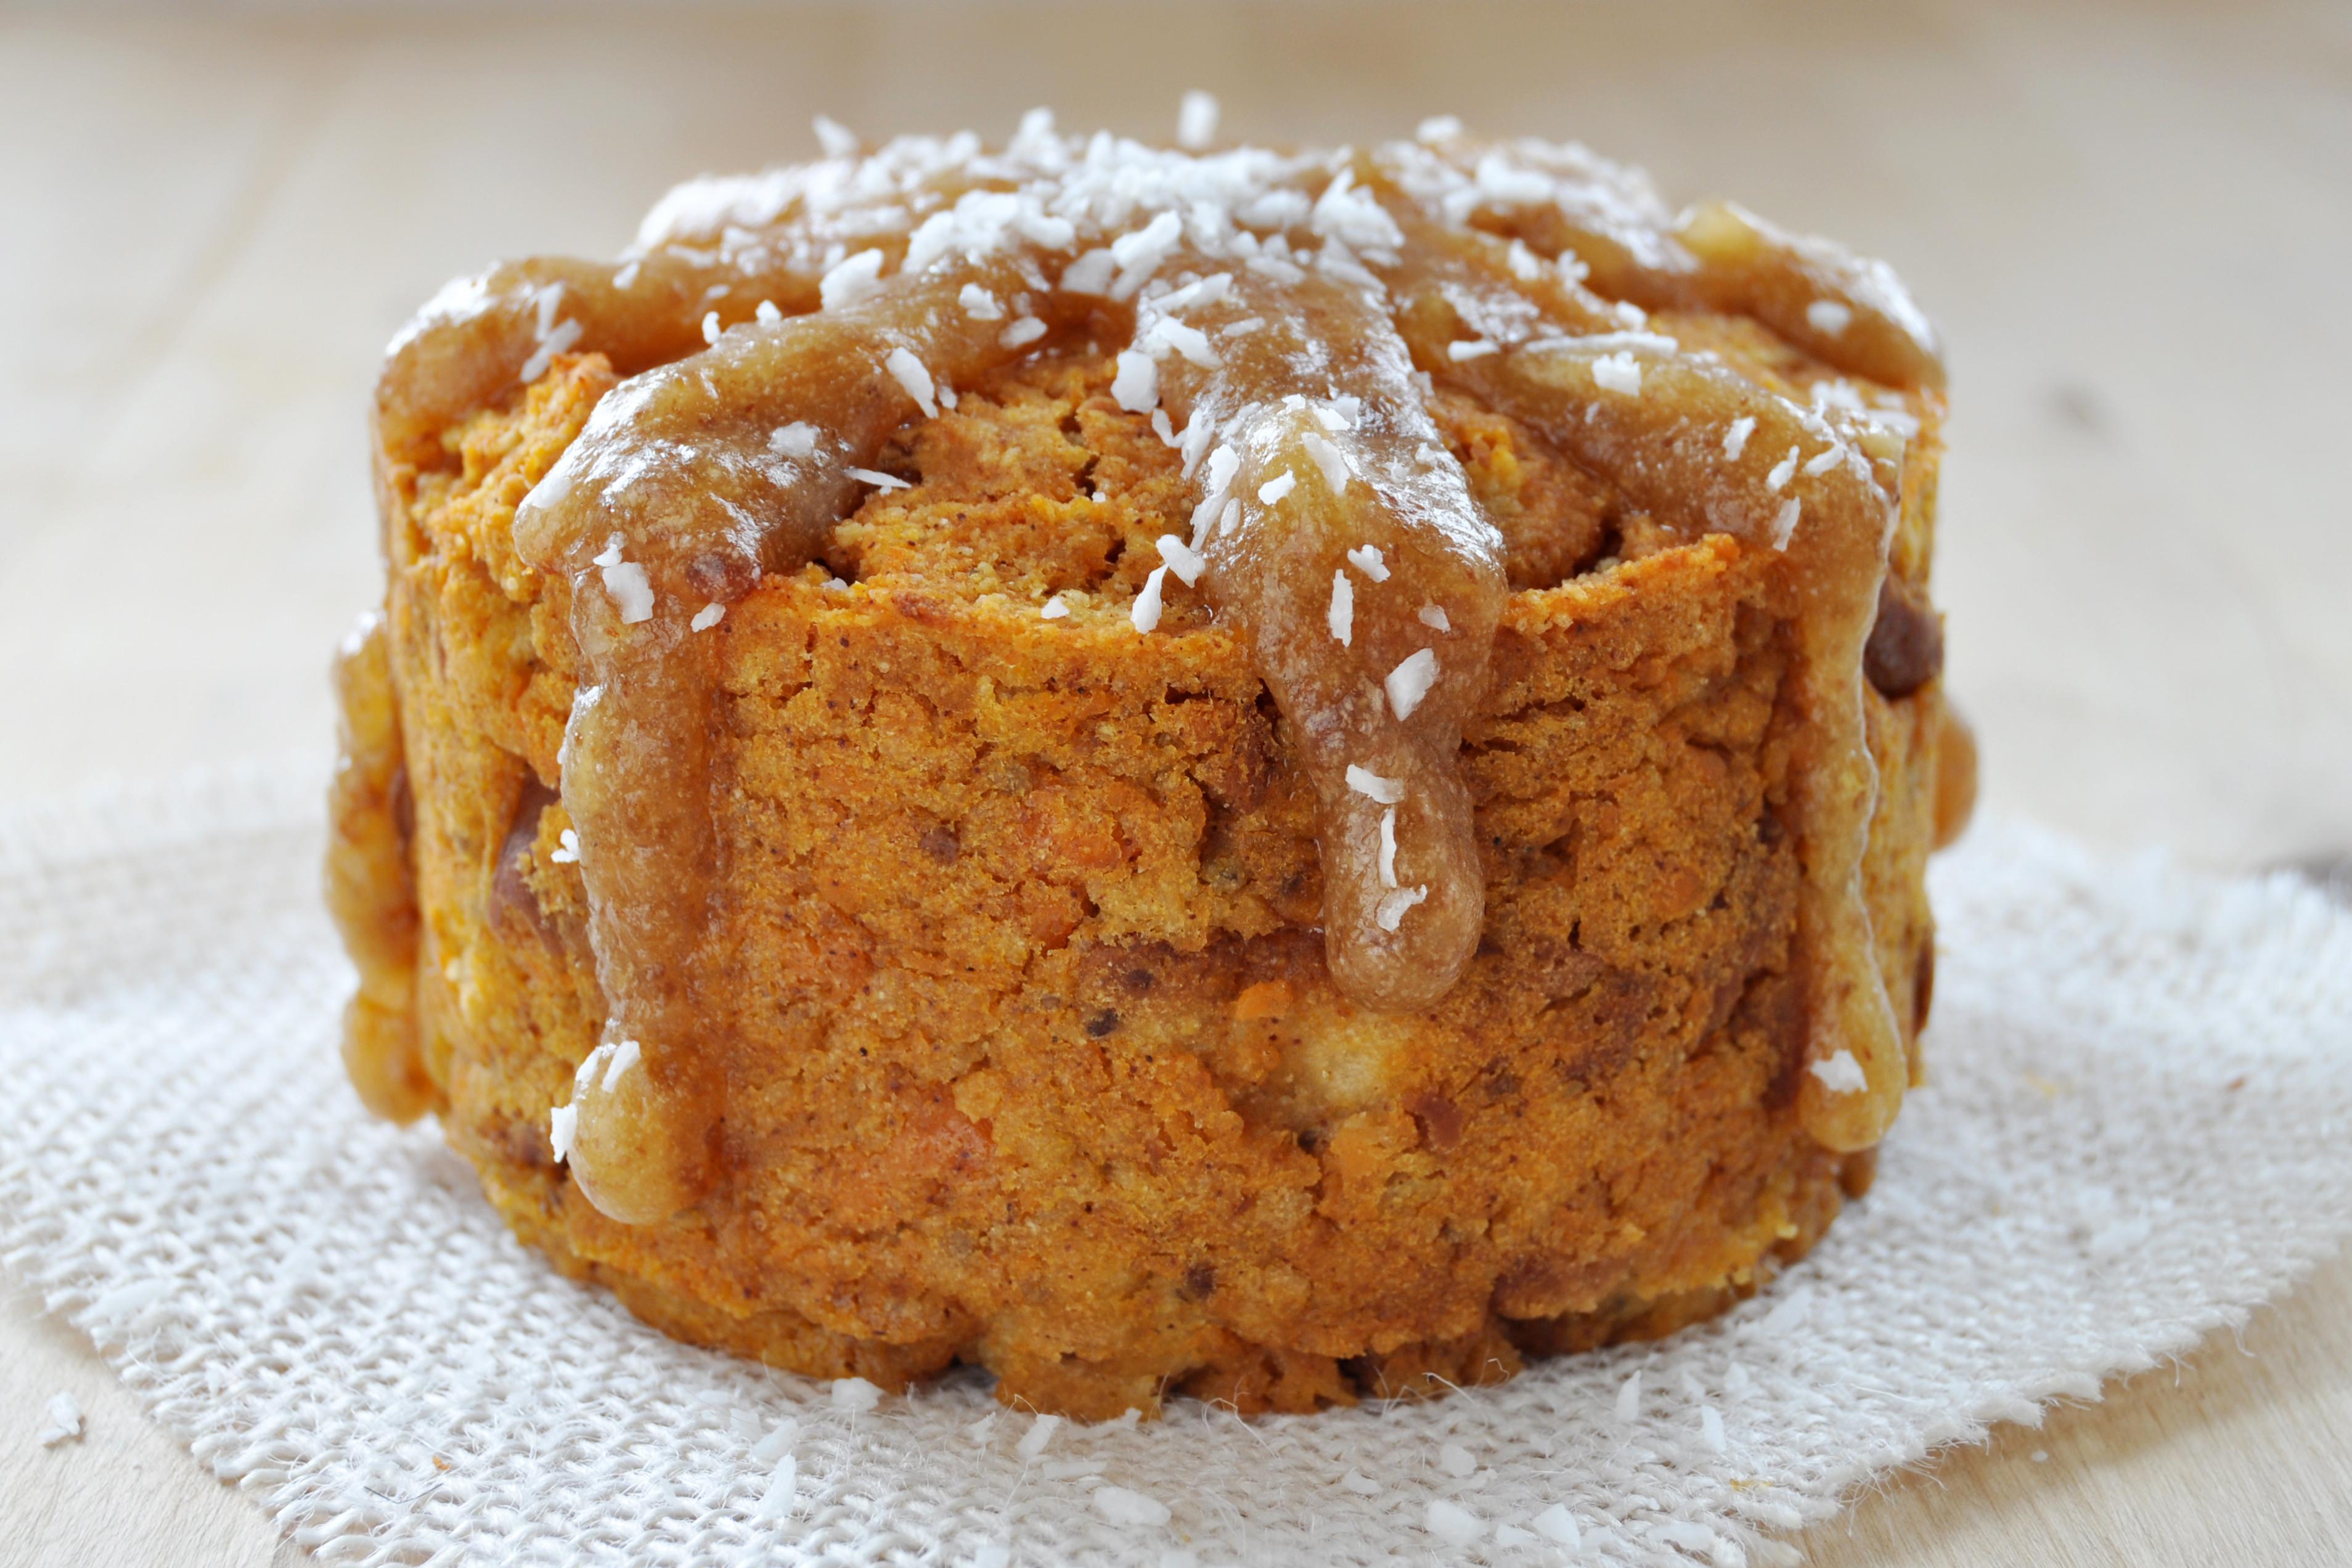 Bread Pudding Dessert  Sweet Potato Bread Pudding Caramel Sauce Vegan Gluten Free